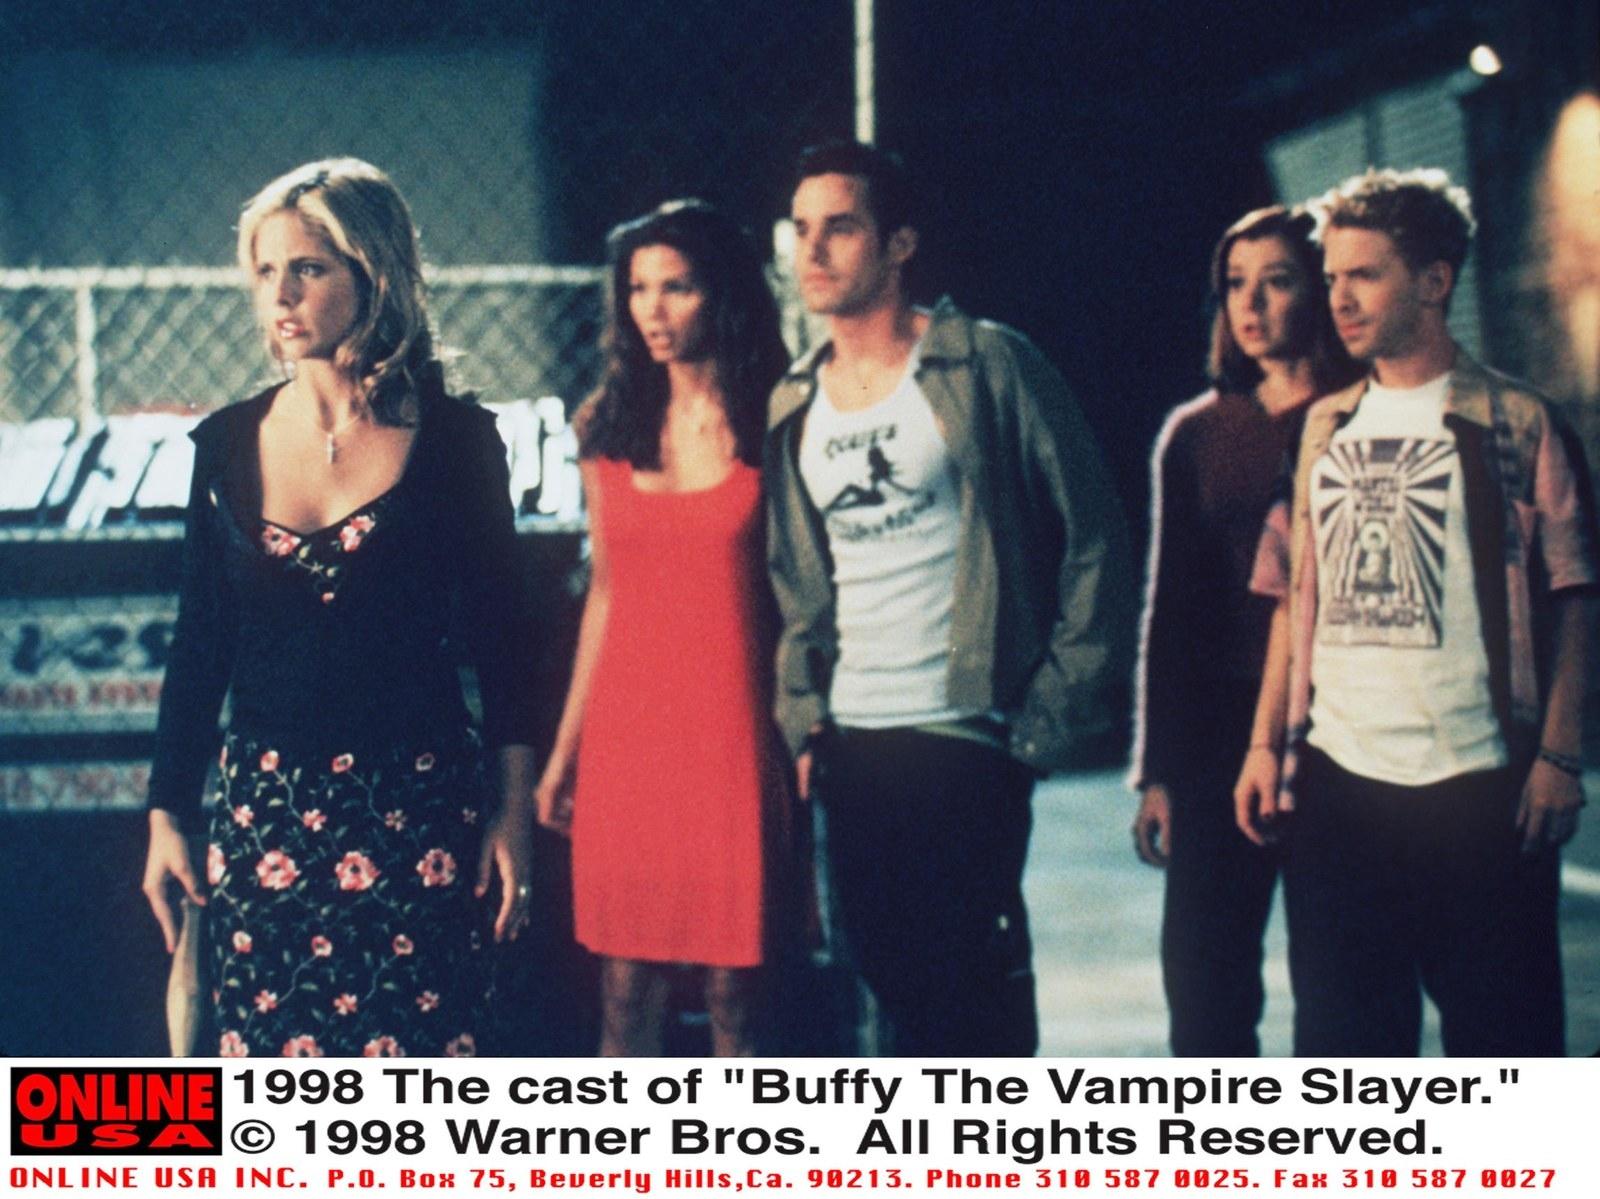 "1998 The cast of ""Buffy The Vampire Slayer."" From l-r: Sarah Michelle Gellar, Charisma Carpenter, Nicholas Brendon, Alyson Hannigan and Seth Green."